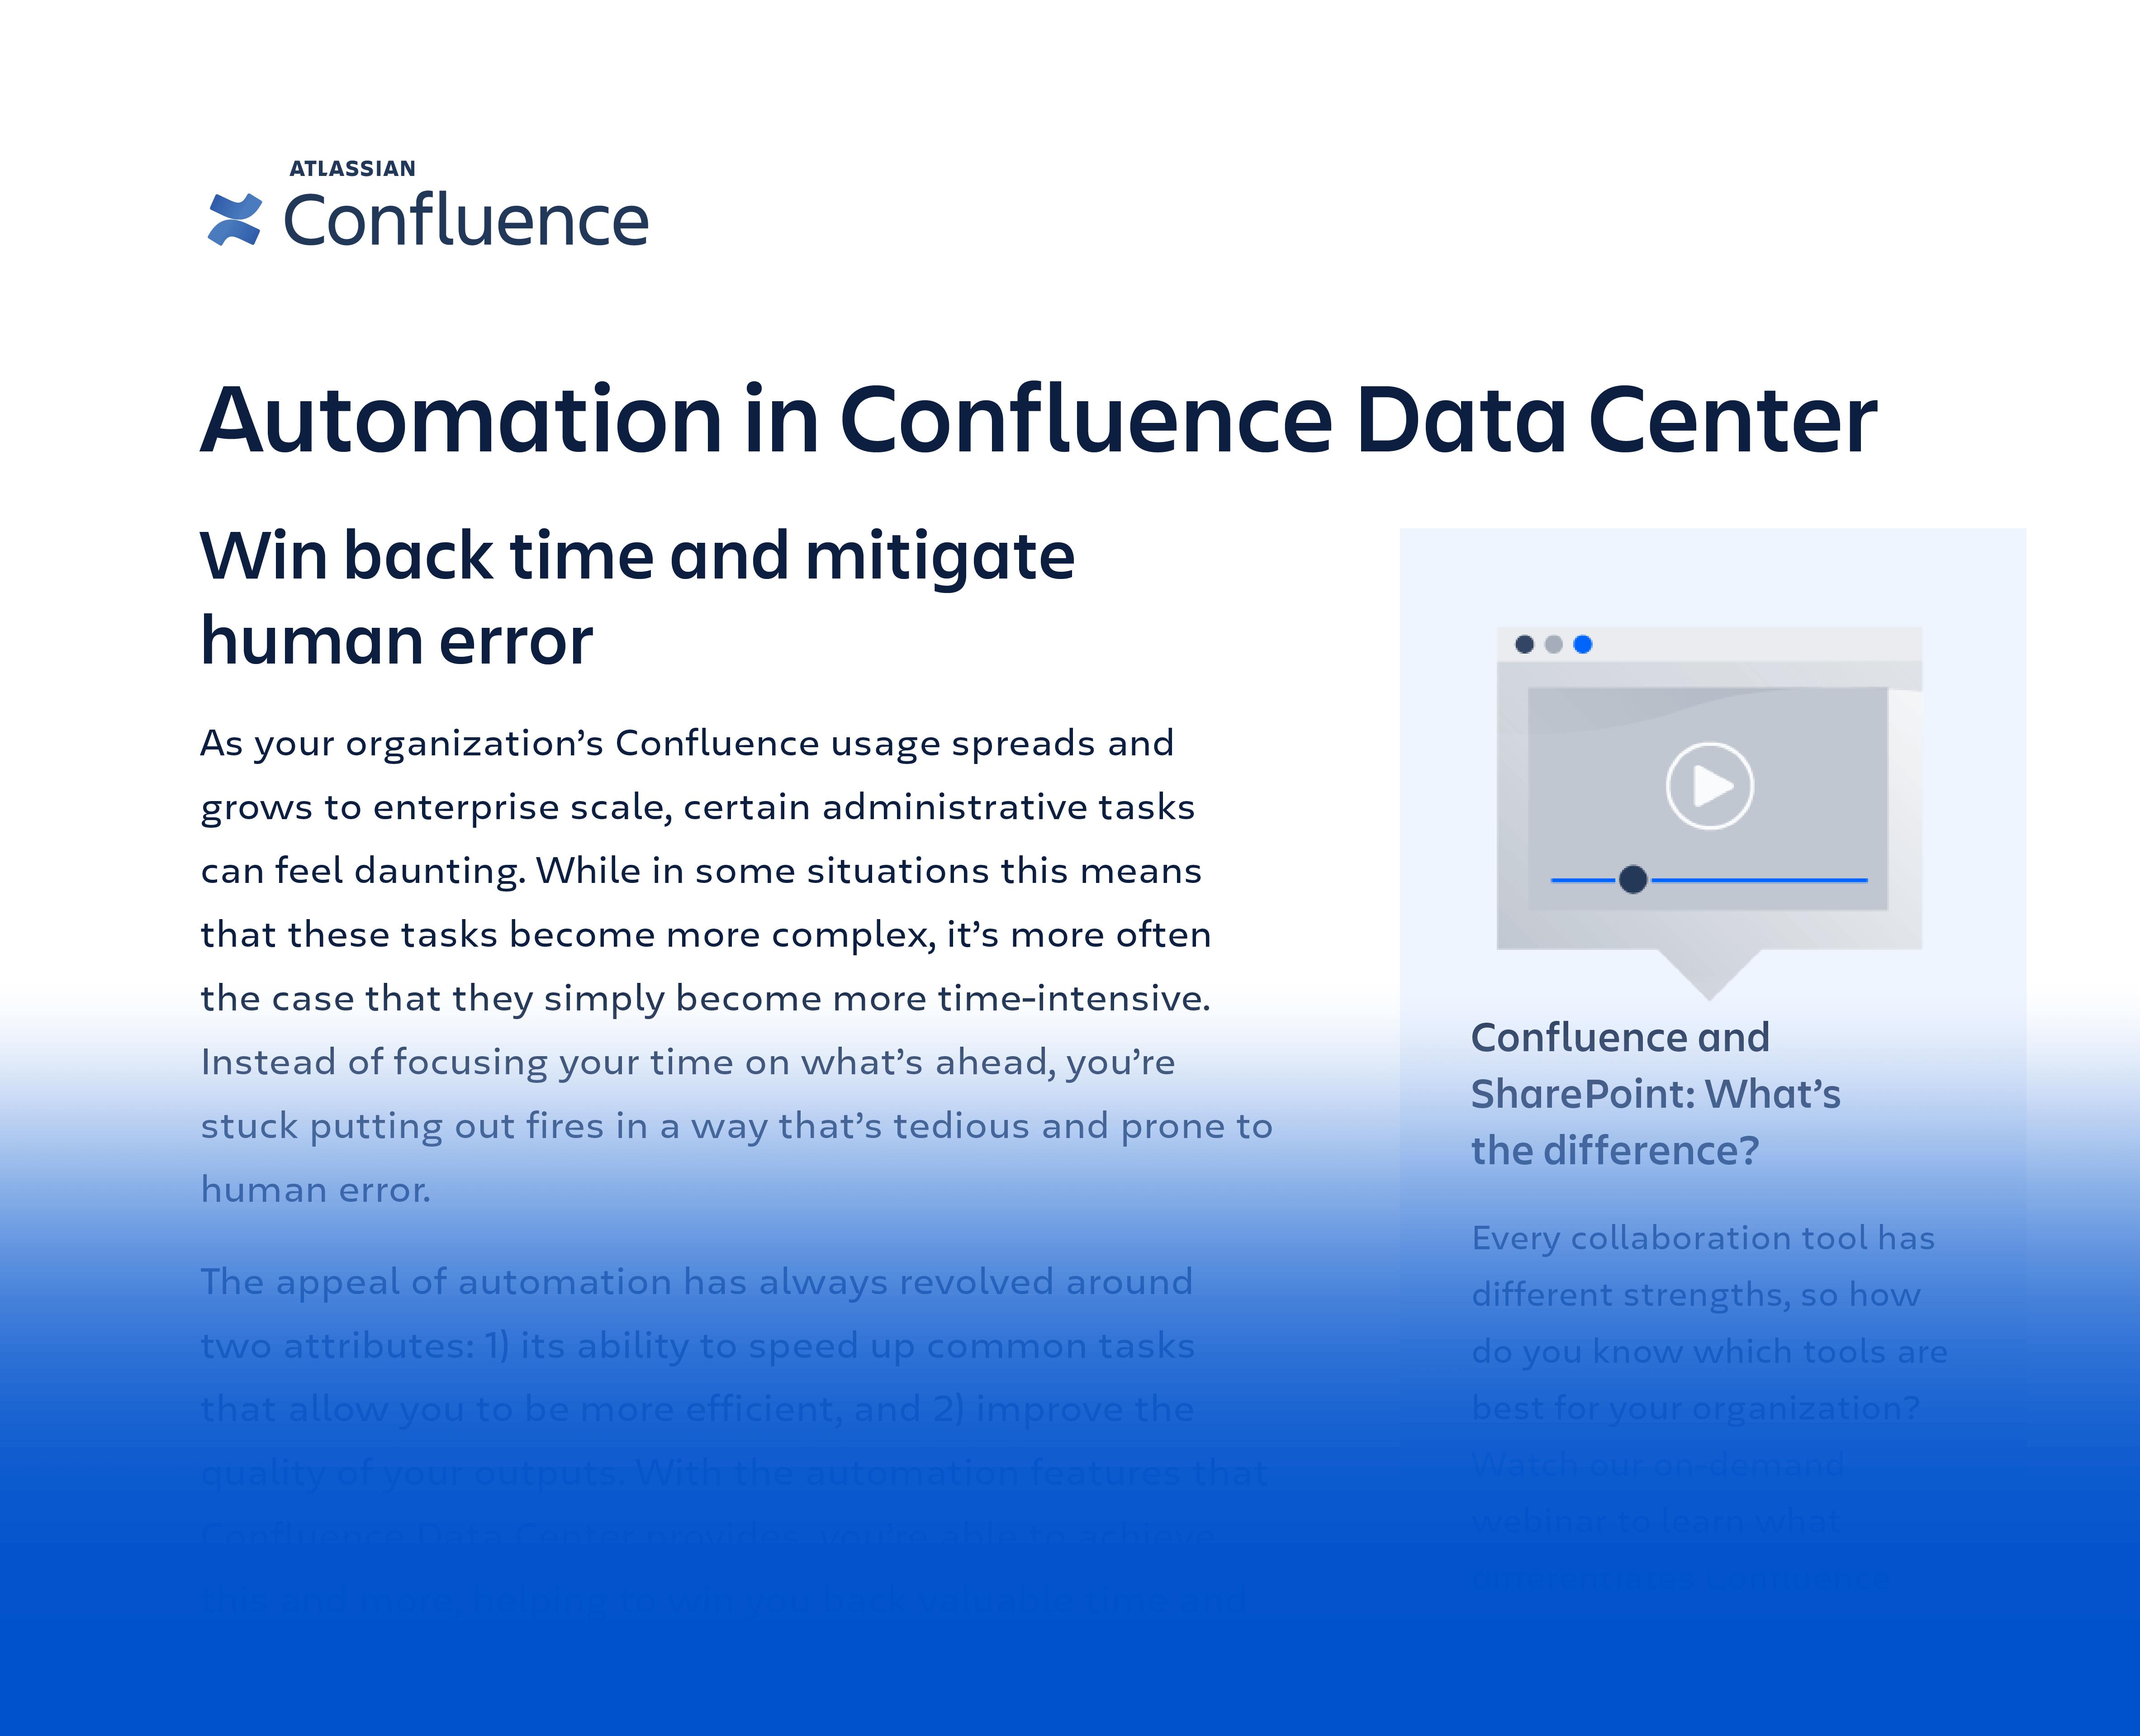 Hoja informativa: La automatización en Confluence Data Center